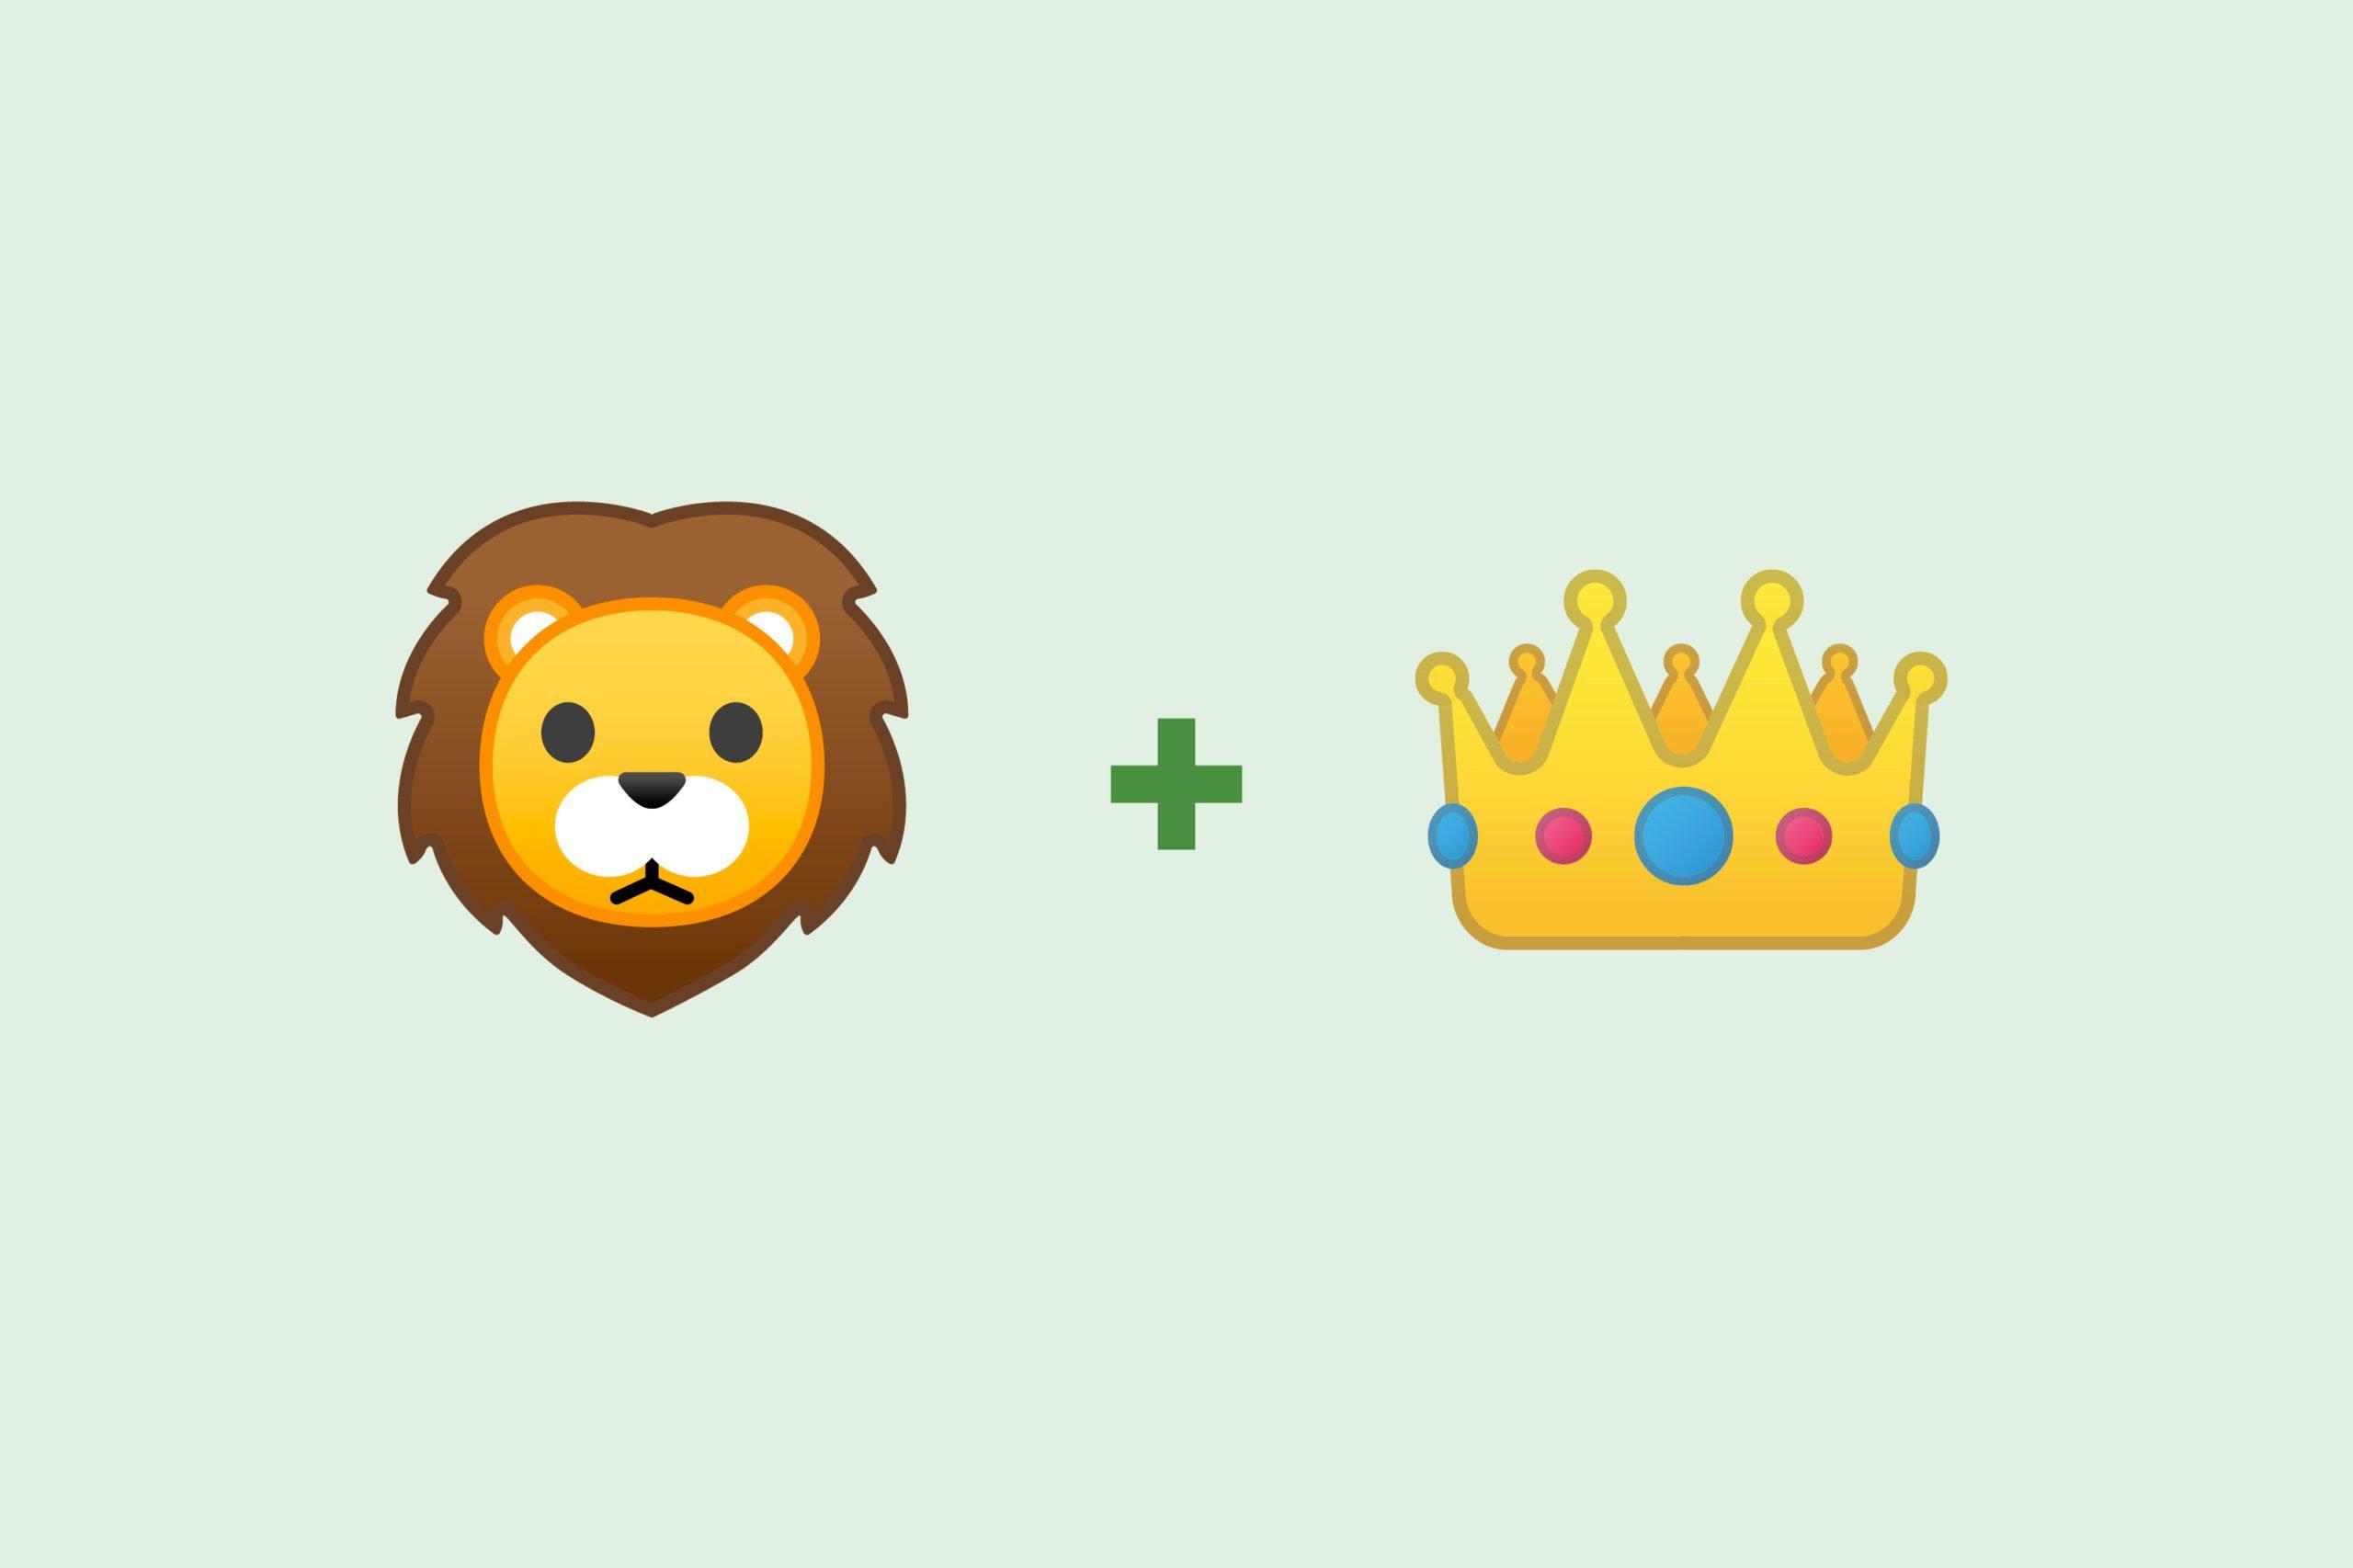 Lion emoji + crown emoji